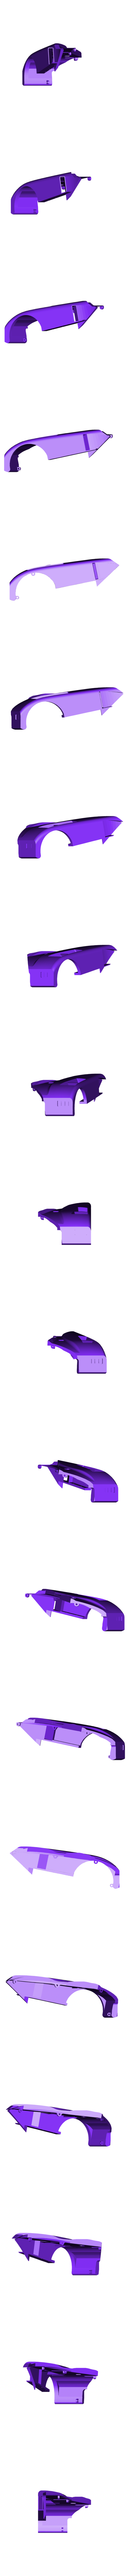 rear fender right.stl Download free STL file 1991 Mazda 787B 3d Printed RC Car • 3D printable template, brett